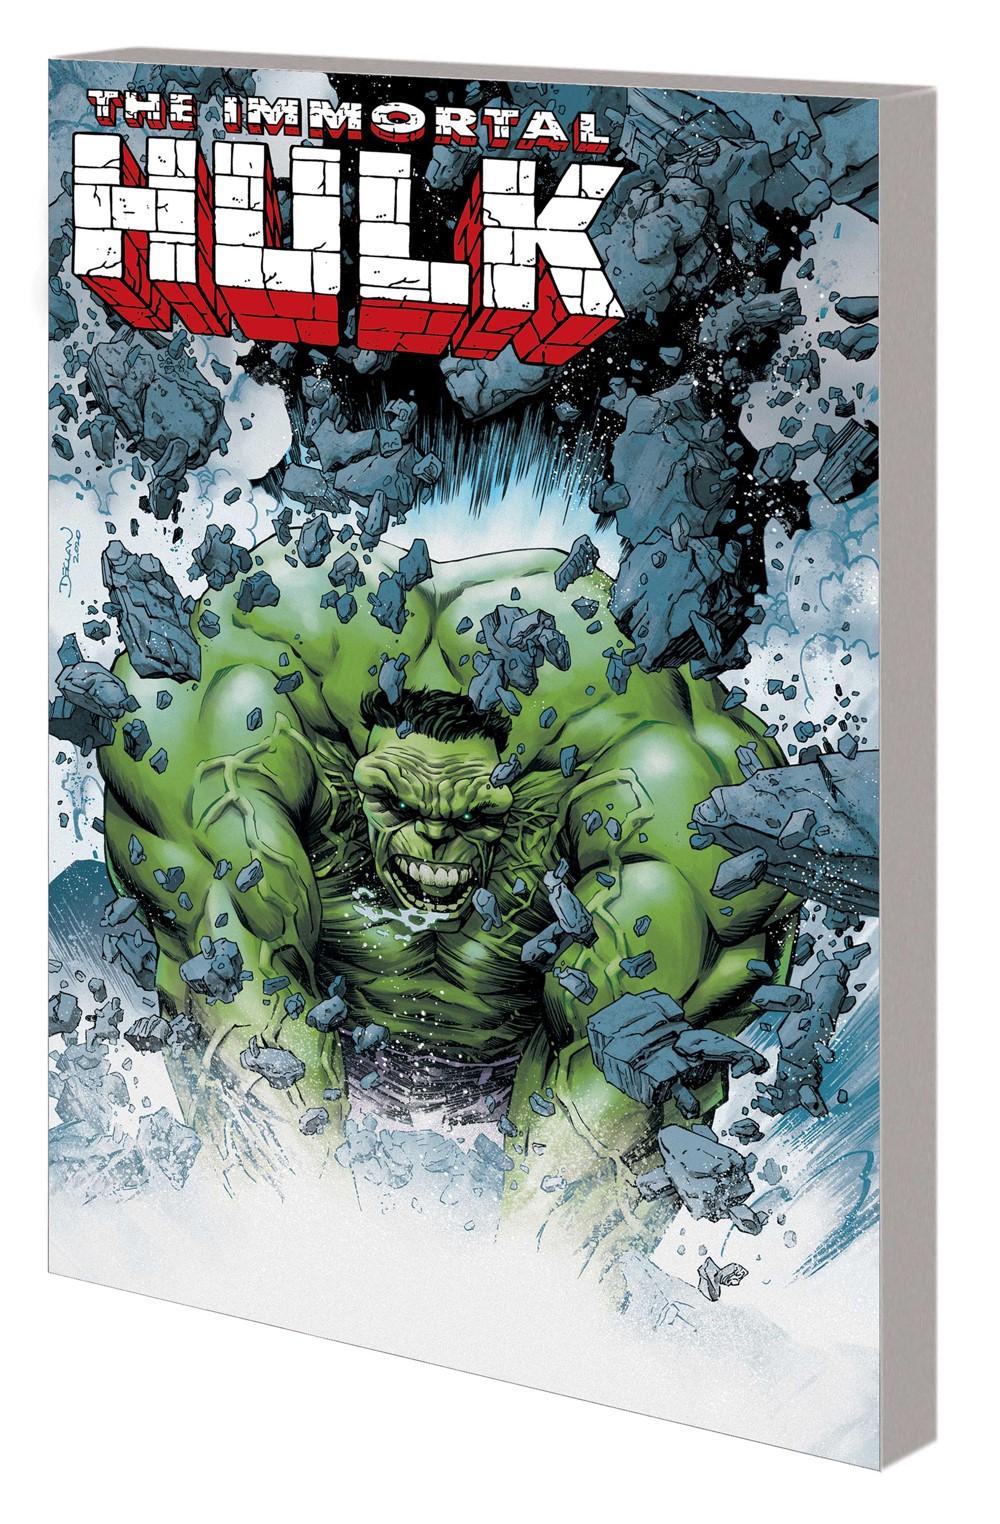 HULK_GREAT_POWER_TPB Marvel Comics September 2021 Solicitations